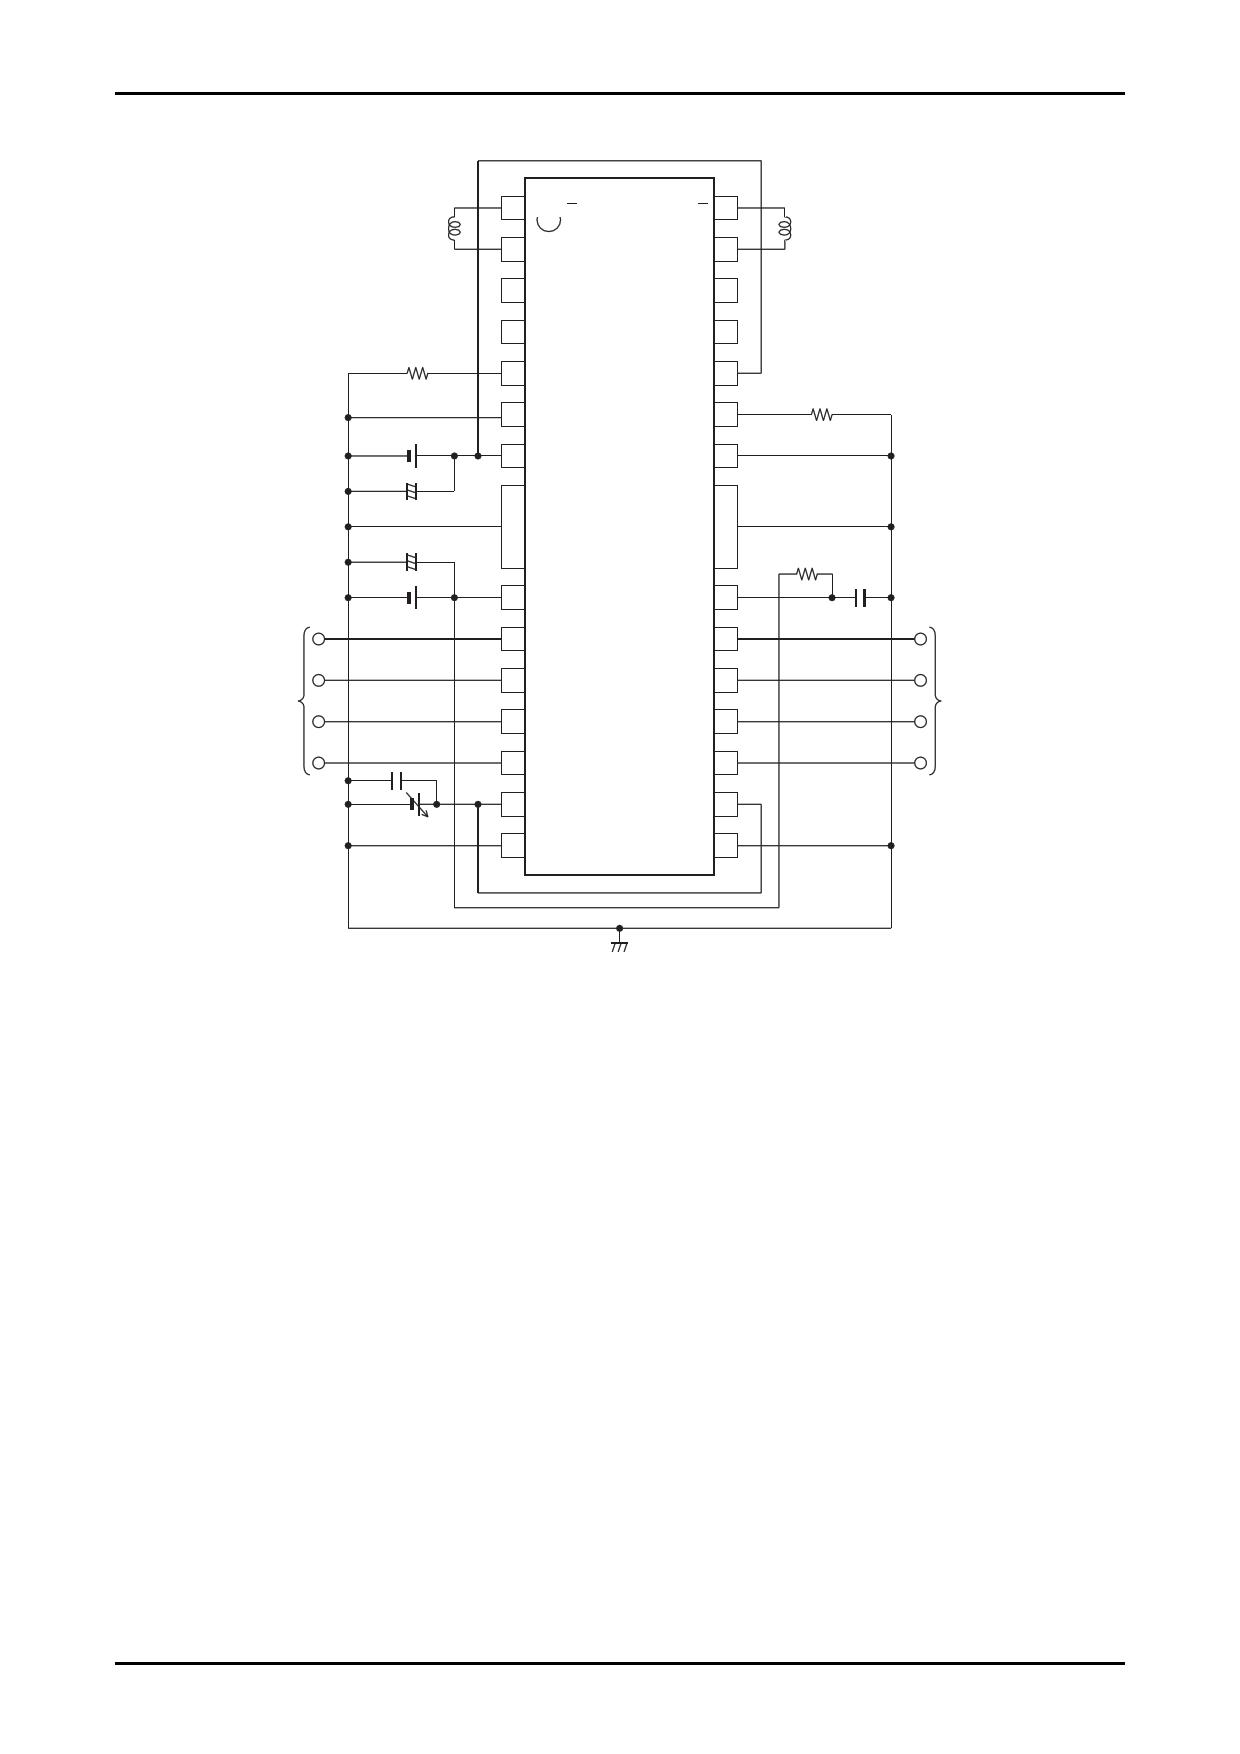 LB1945H 電子部品, 半導体